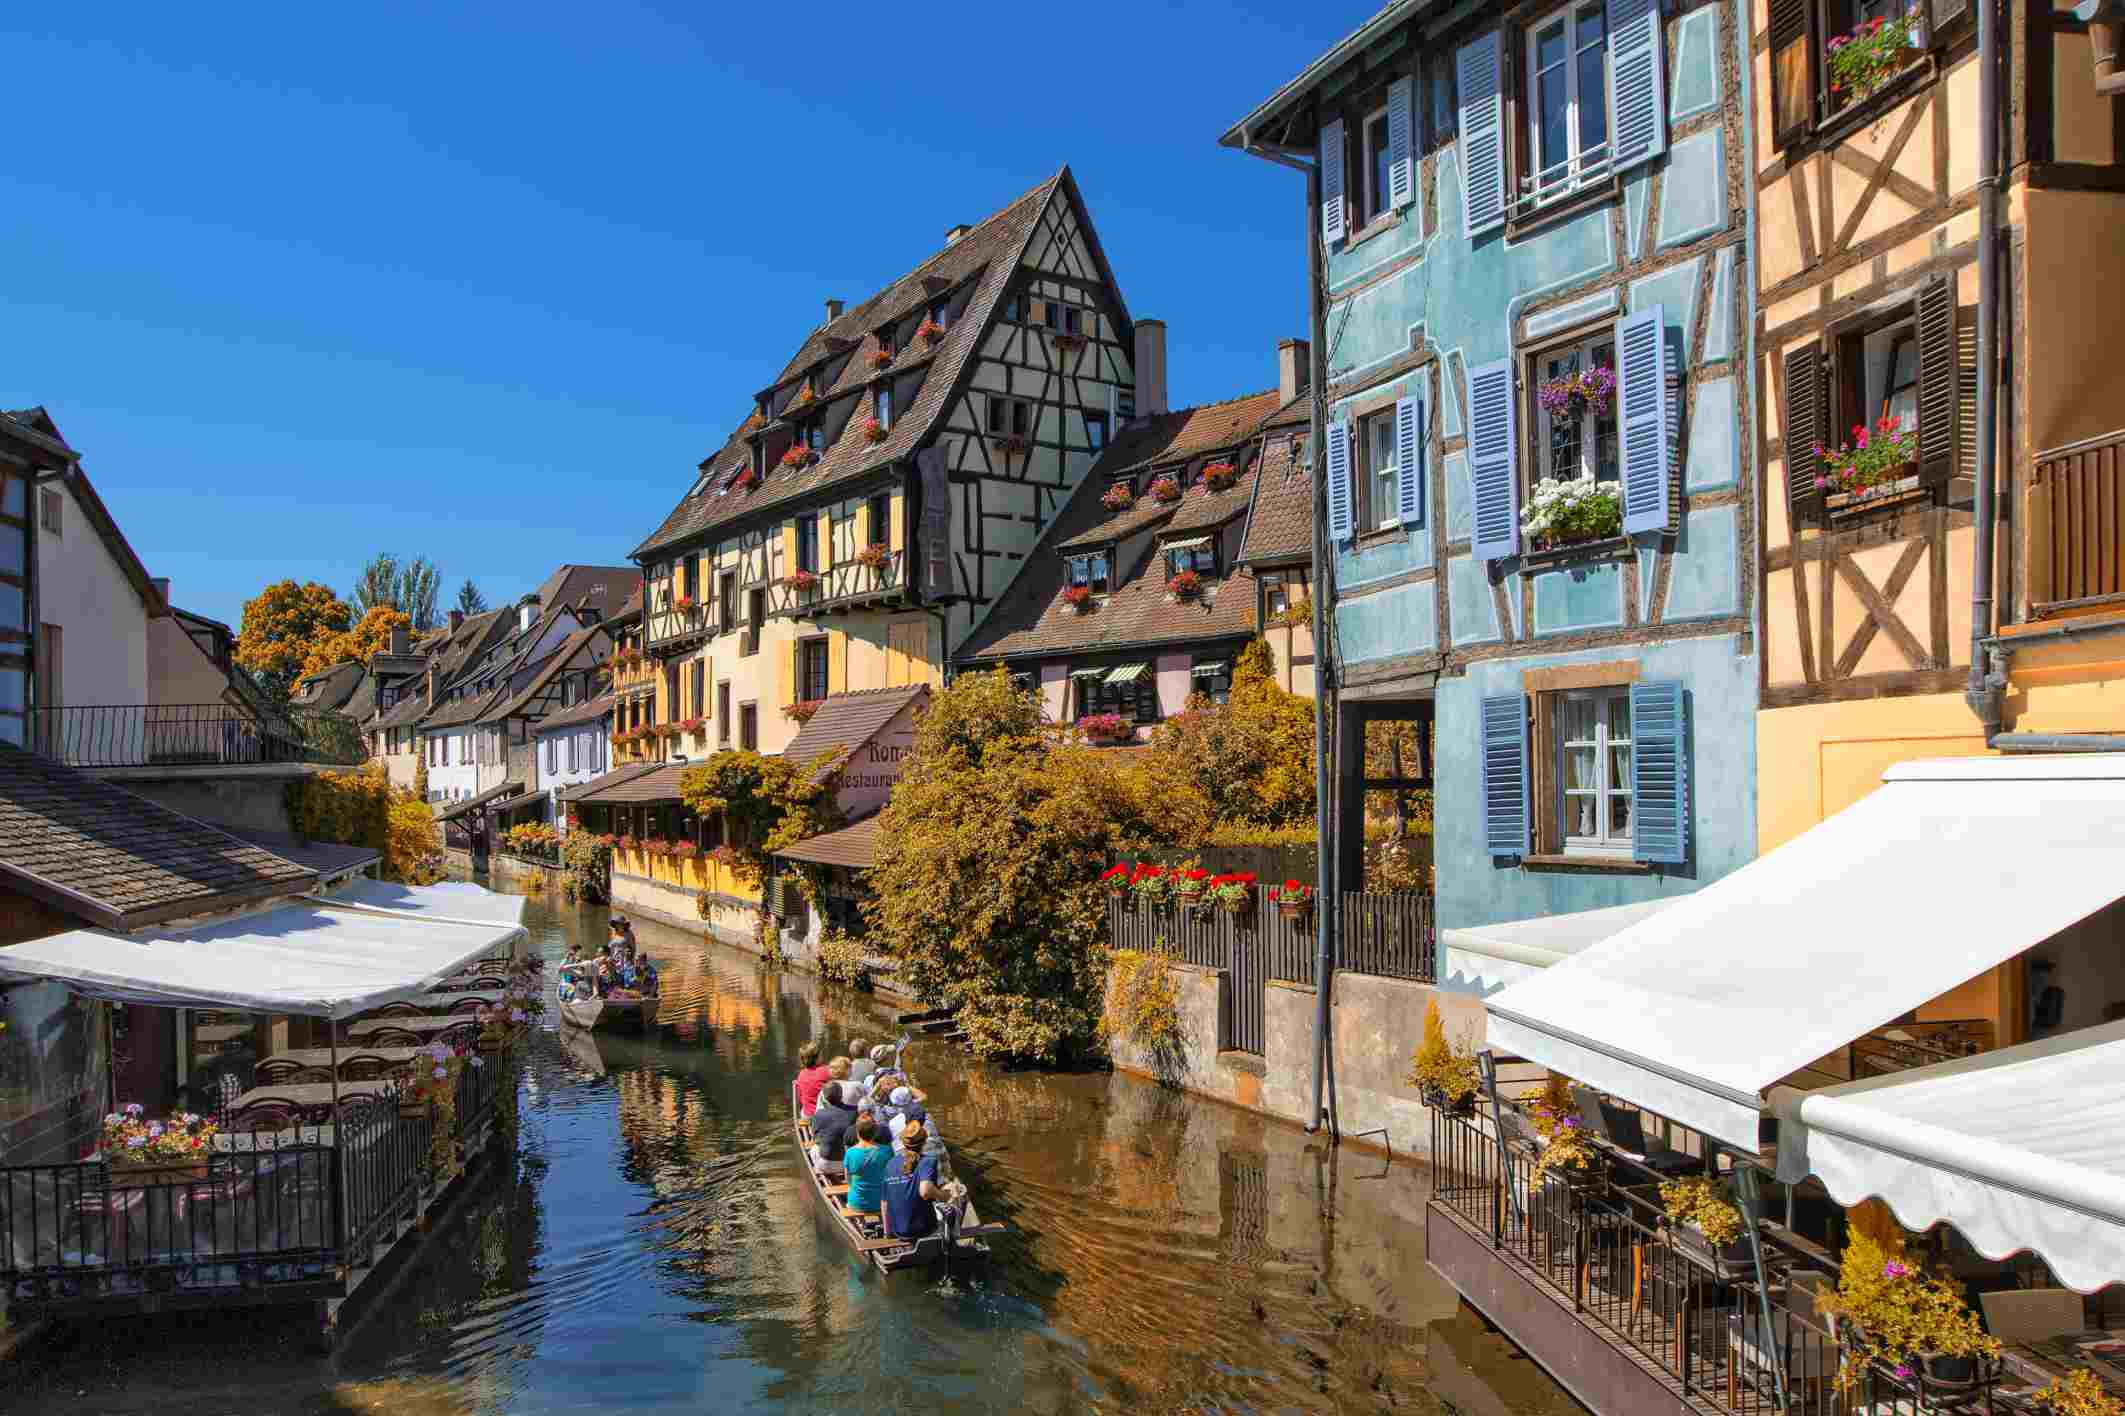 Elsass Karte Colmar.Virtual Tour Of Colmar In Alsace France